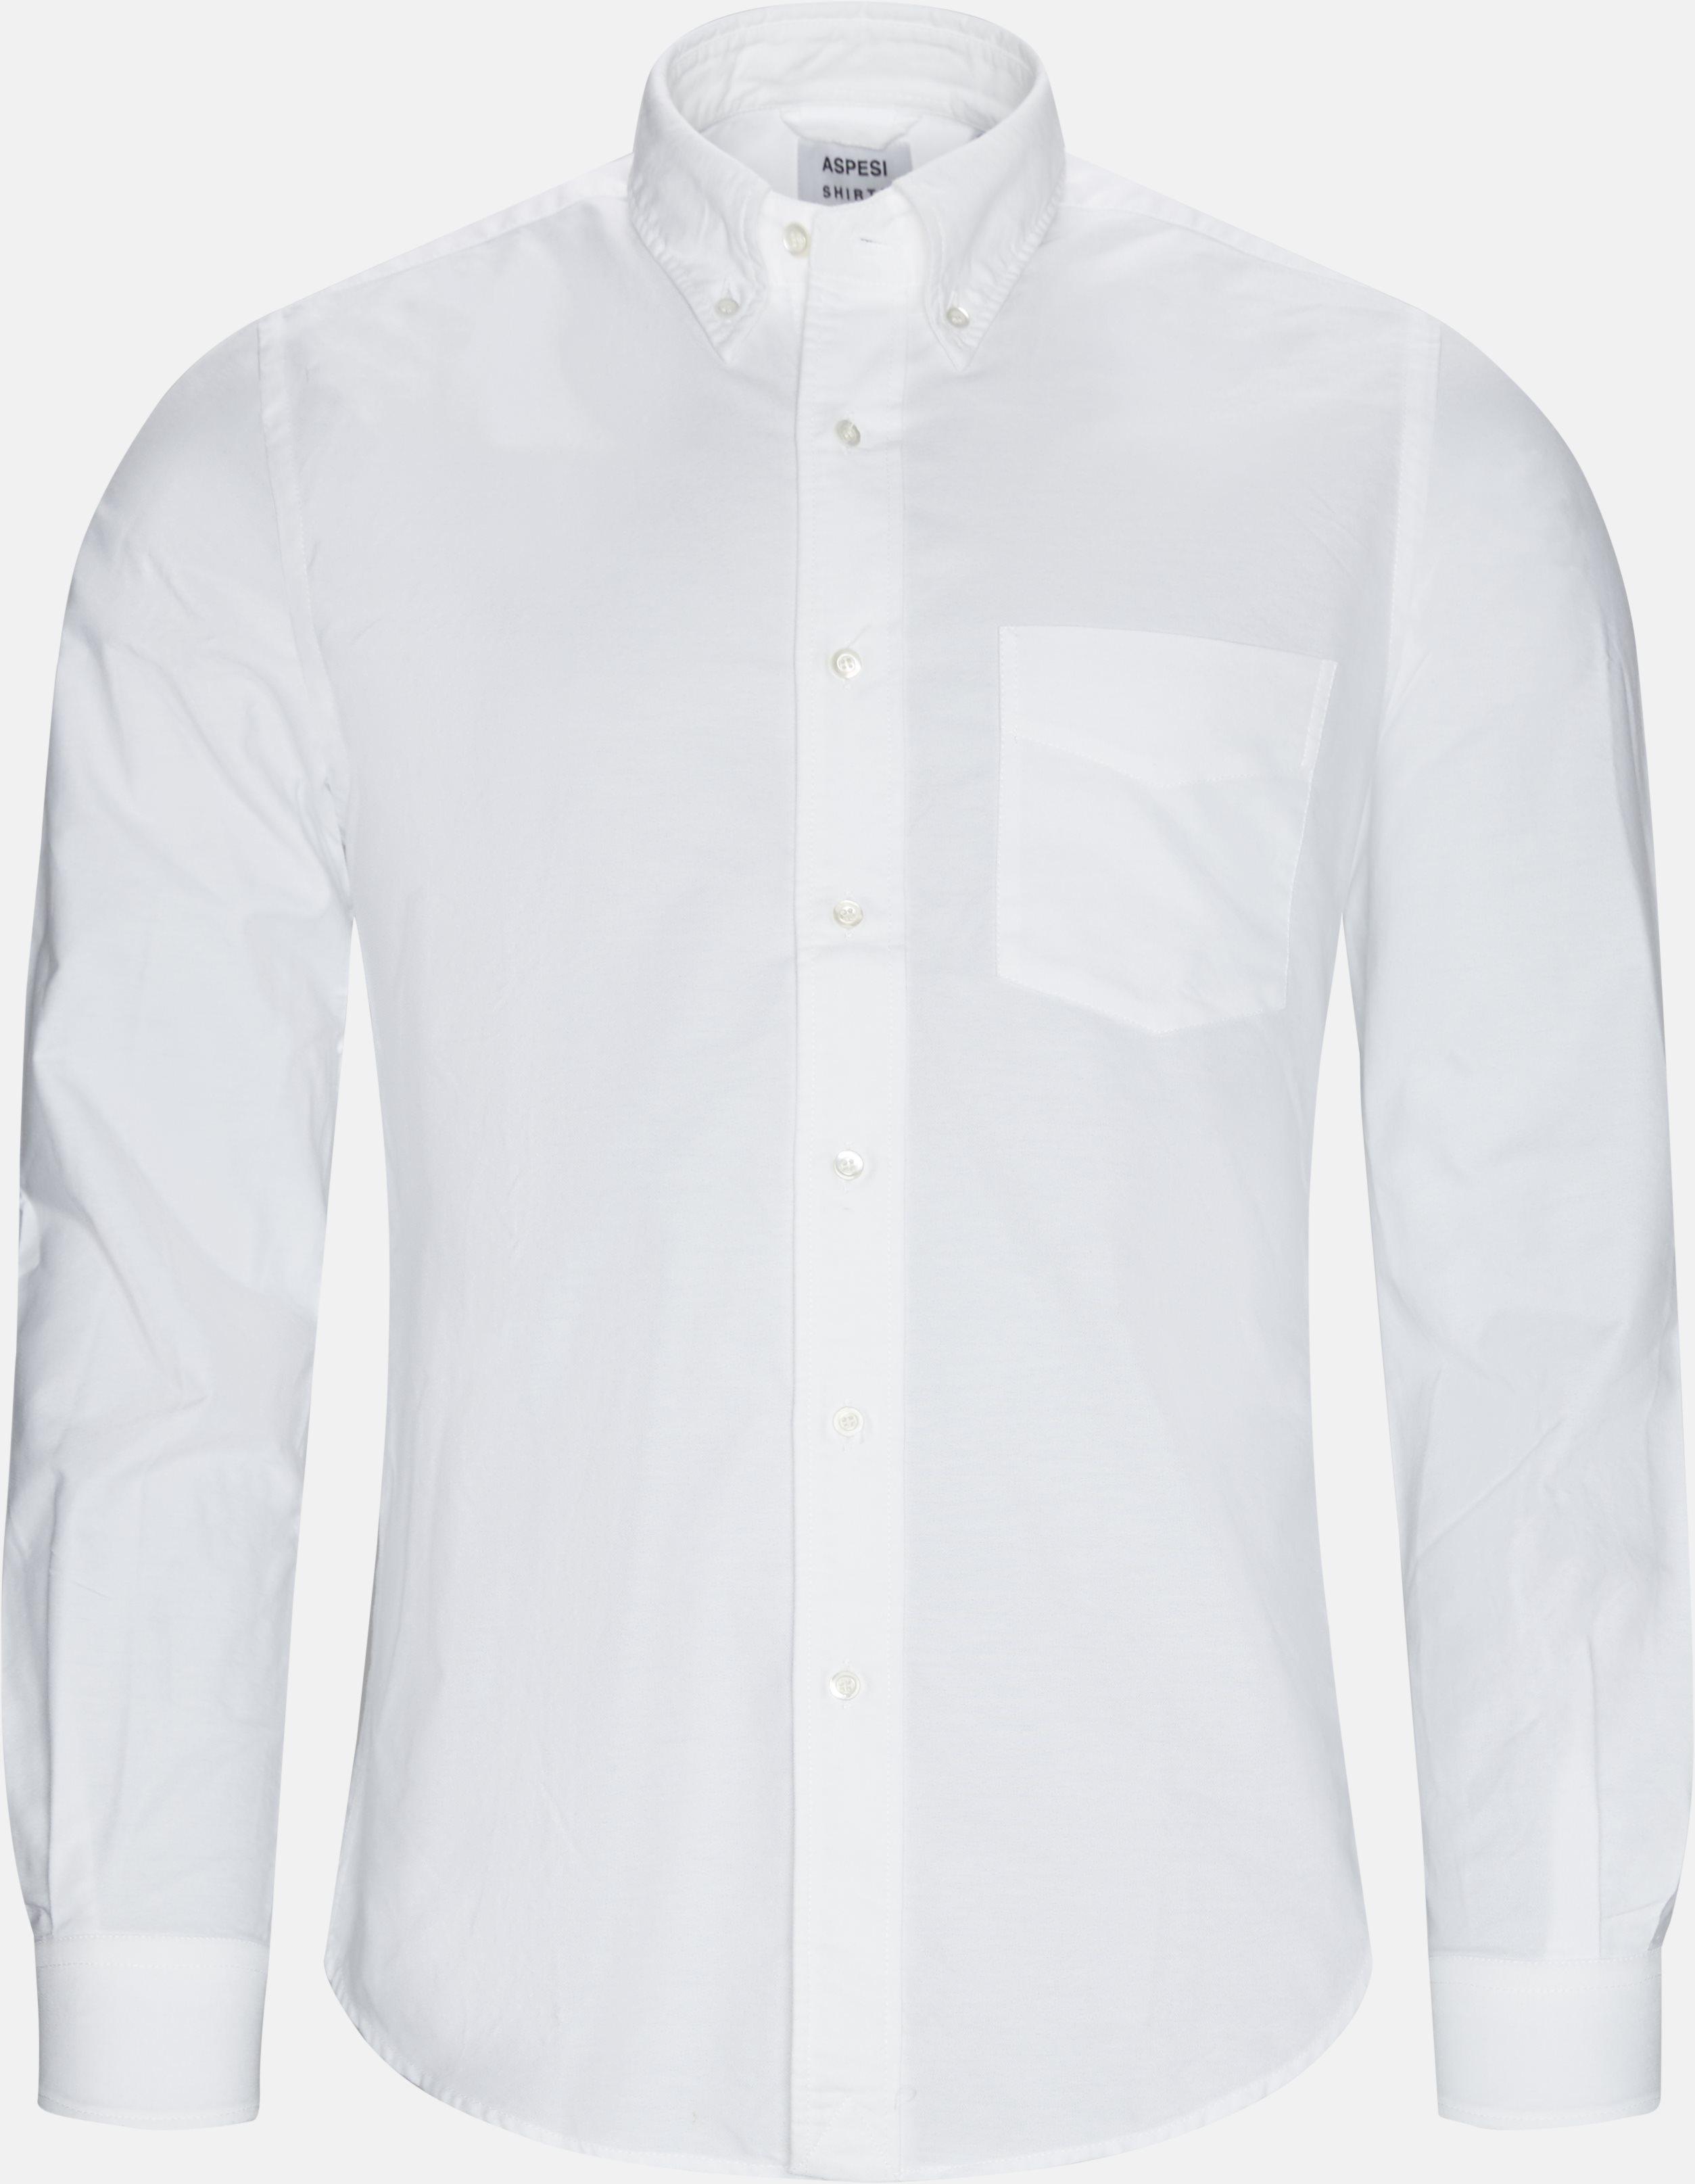 Oxford Skjorte - Skjorter - Regular fit - Hvid